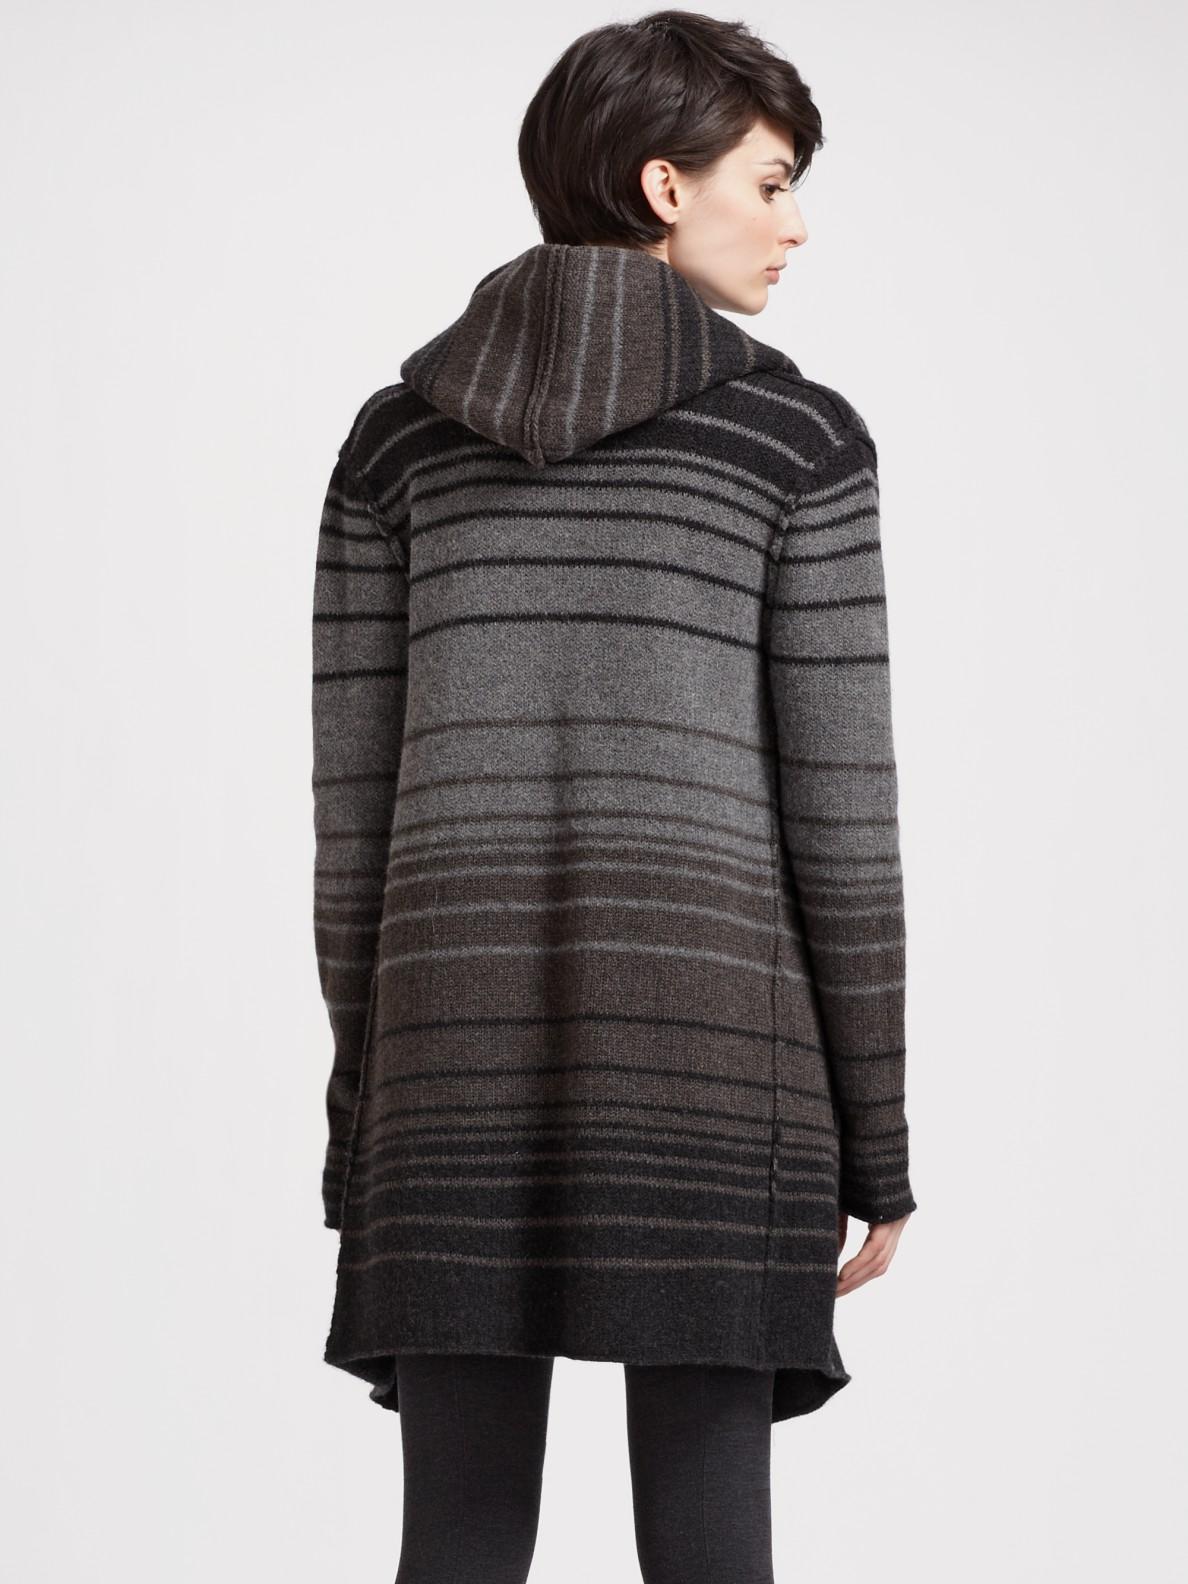 Lyst Vince Sophie Striped Sweater Coat In Black